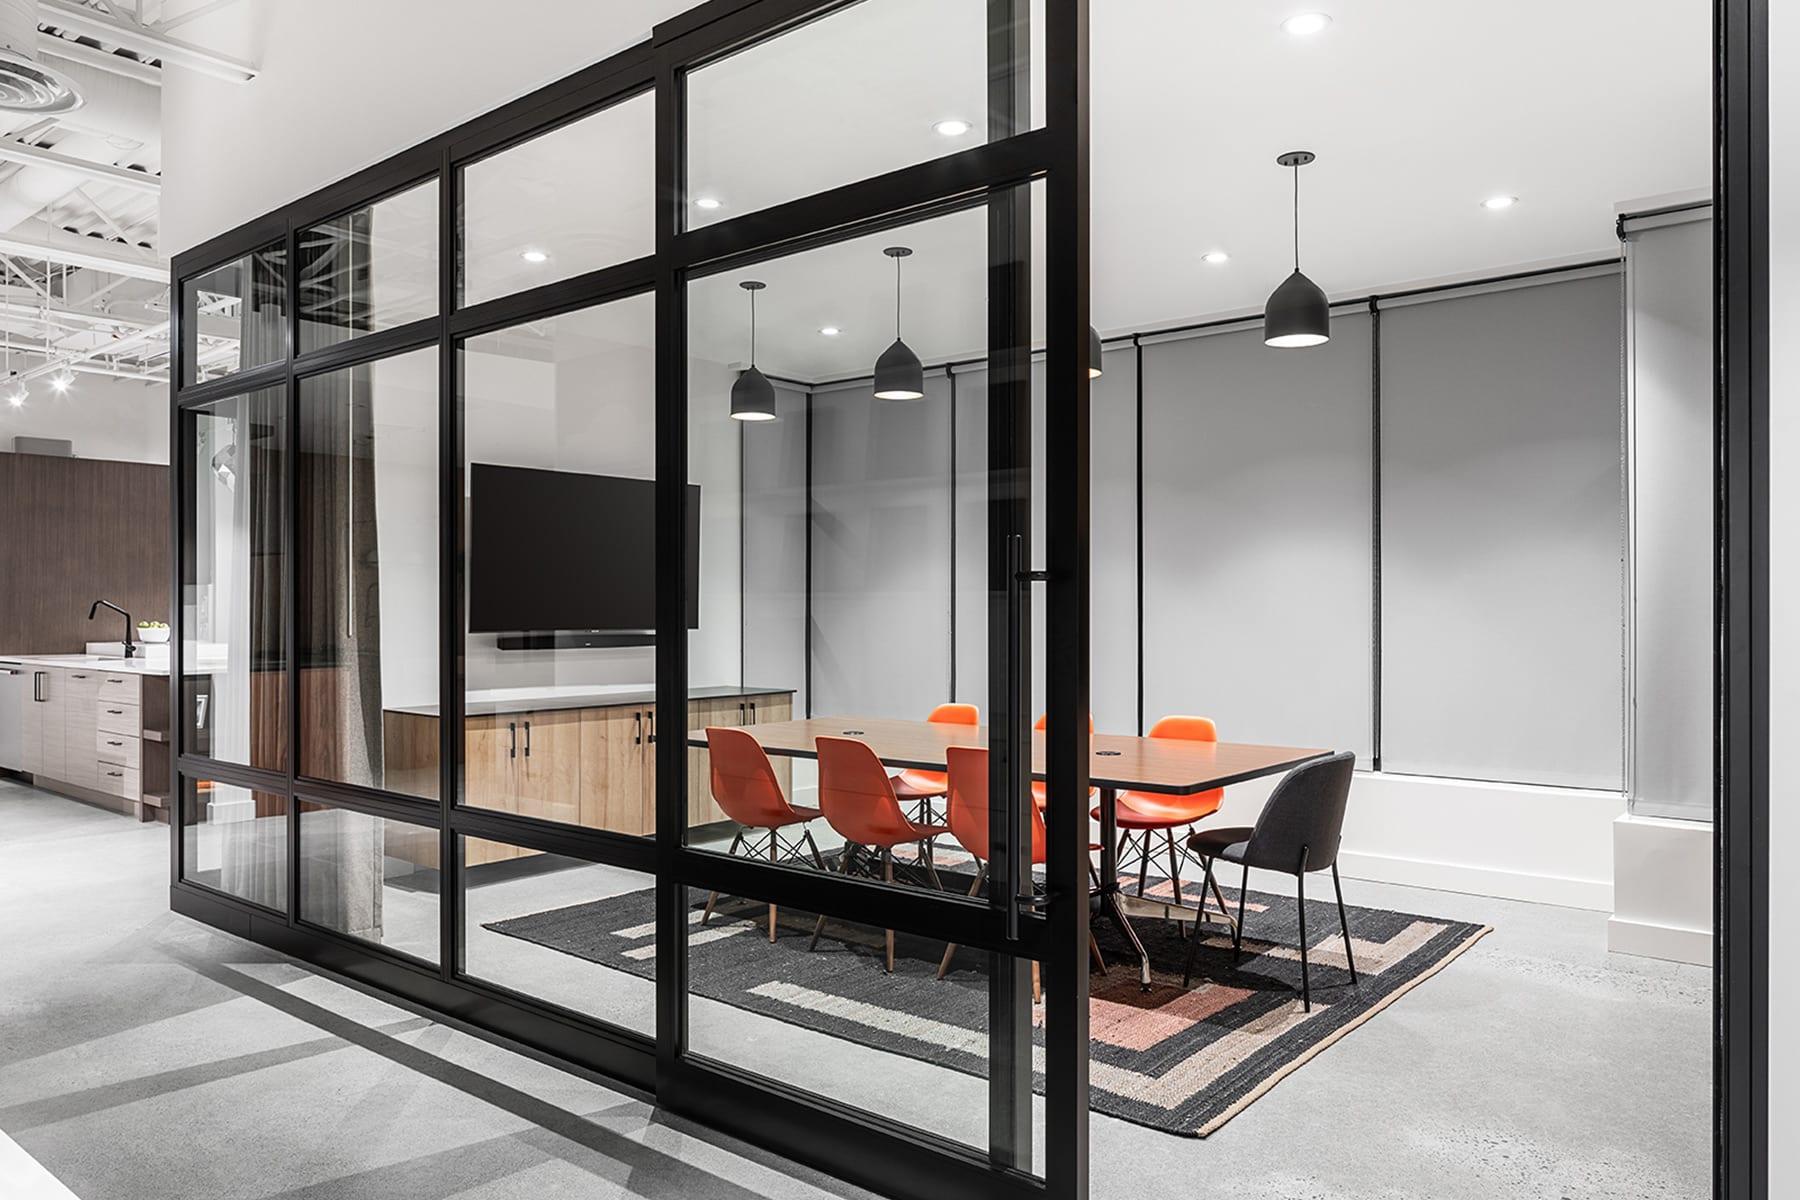 Richmond Kitchen Art Design Meeting Room with Demountable, Modular Partitions